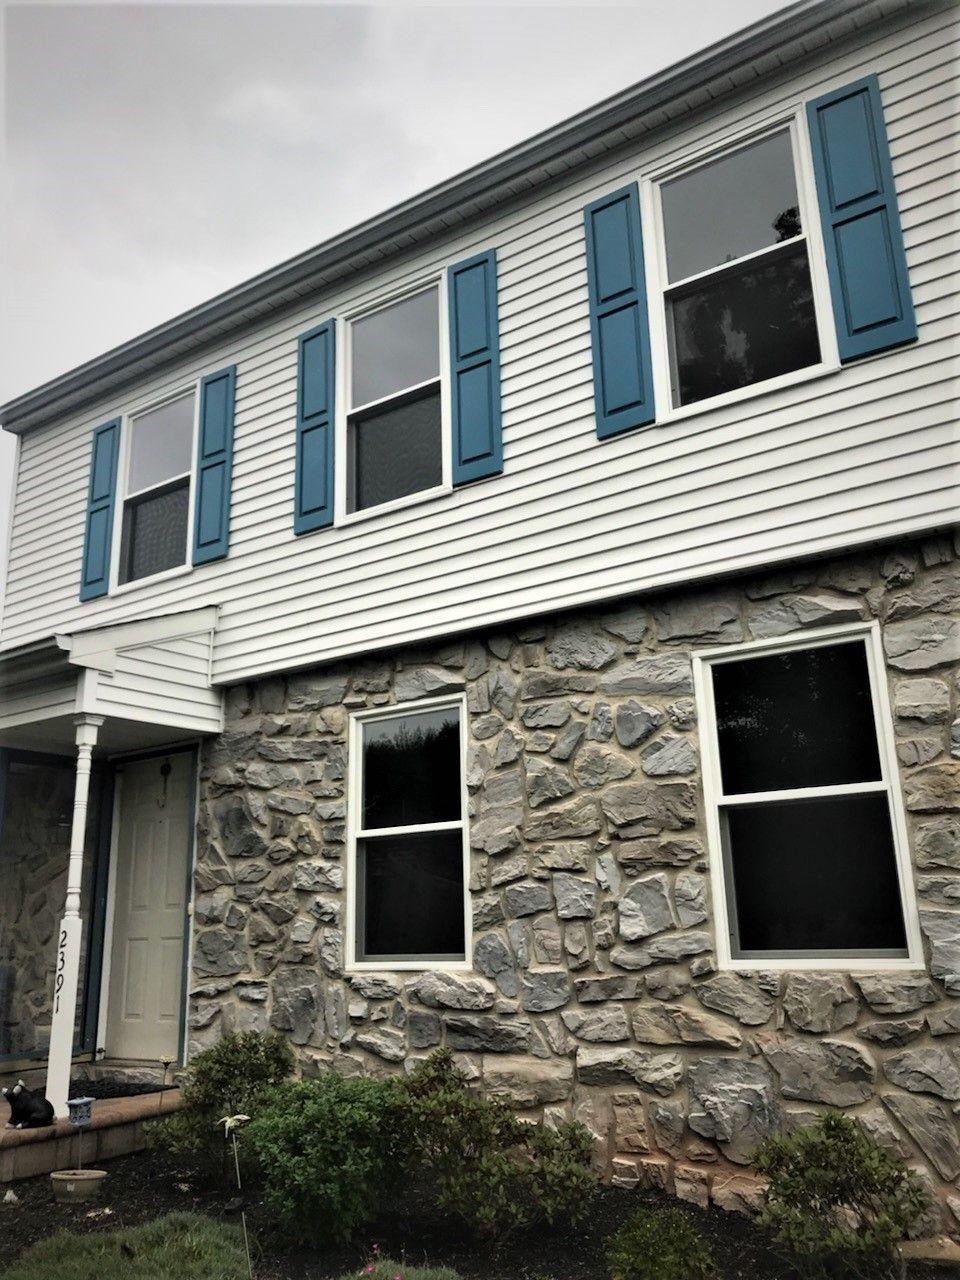 Installing Marvin Infinity Double Hung Windows With White Exterior On Home In Warrington Pa Fiberglass Windows Patio Door Installation Window Vinyl